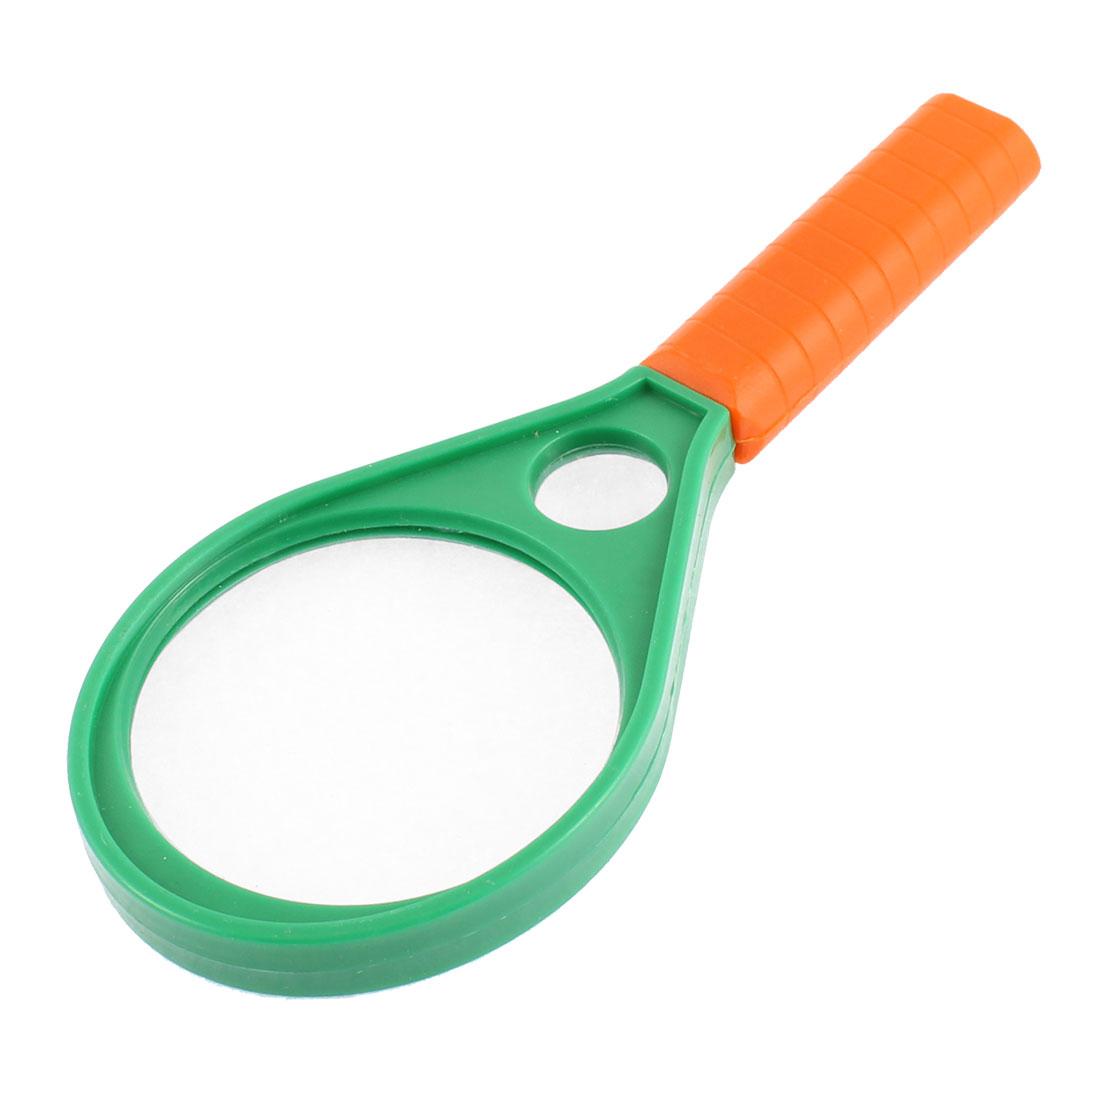 Racket Shaped Nonslip Grip 75mm Lens Handheld Reading Magnifying Glass Magnifier 3X